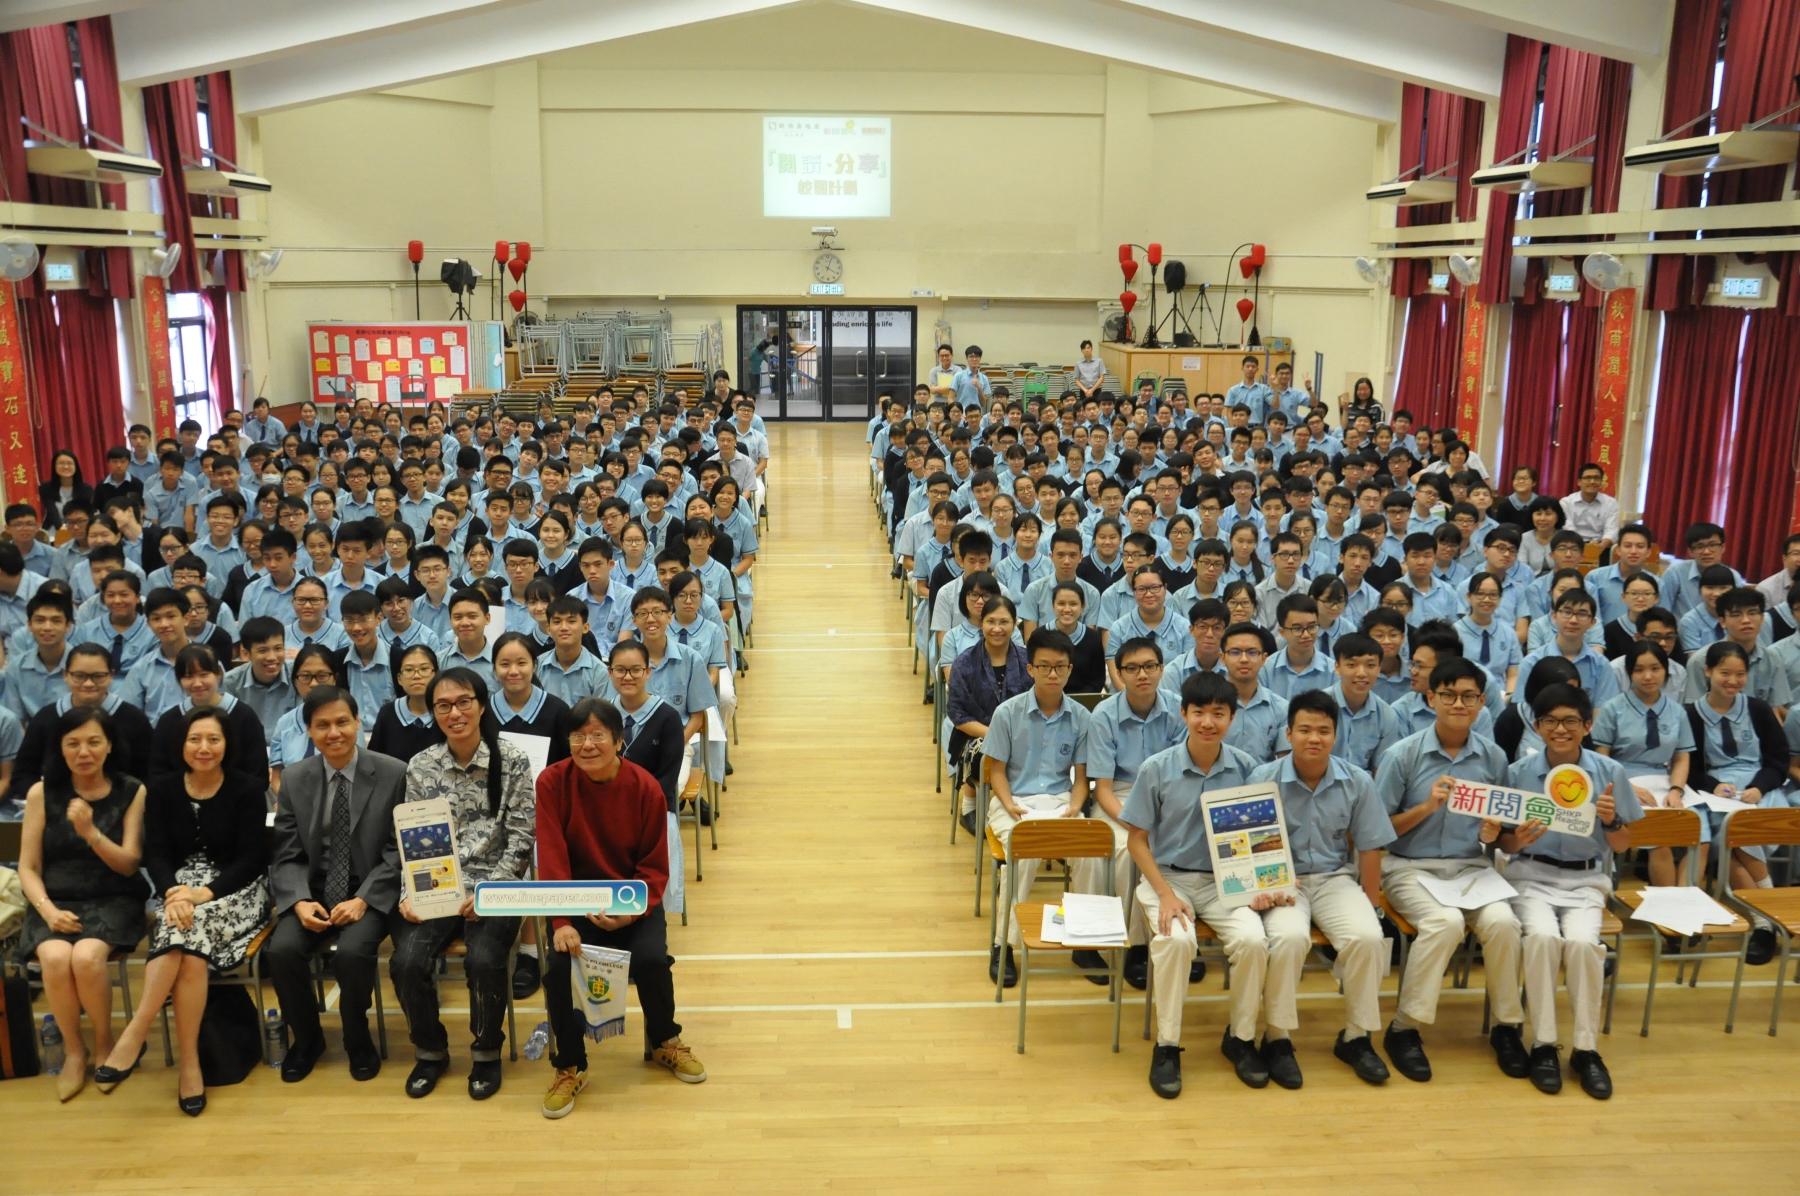 http://www.npc.edu.hk/sites/default/files/dsc_0055.jpg